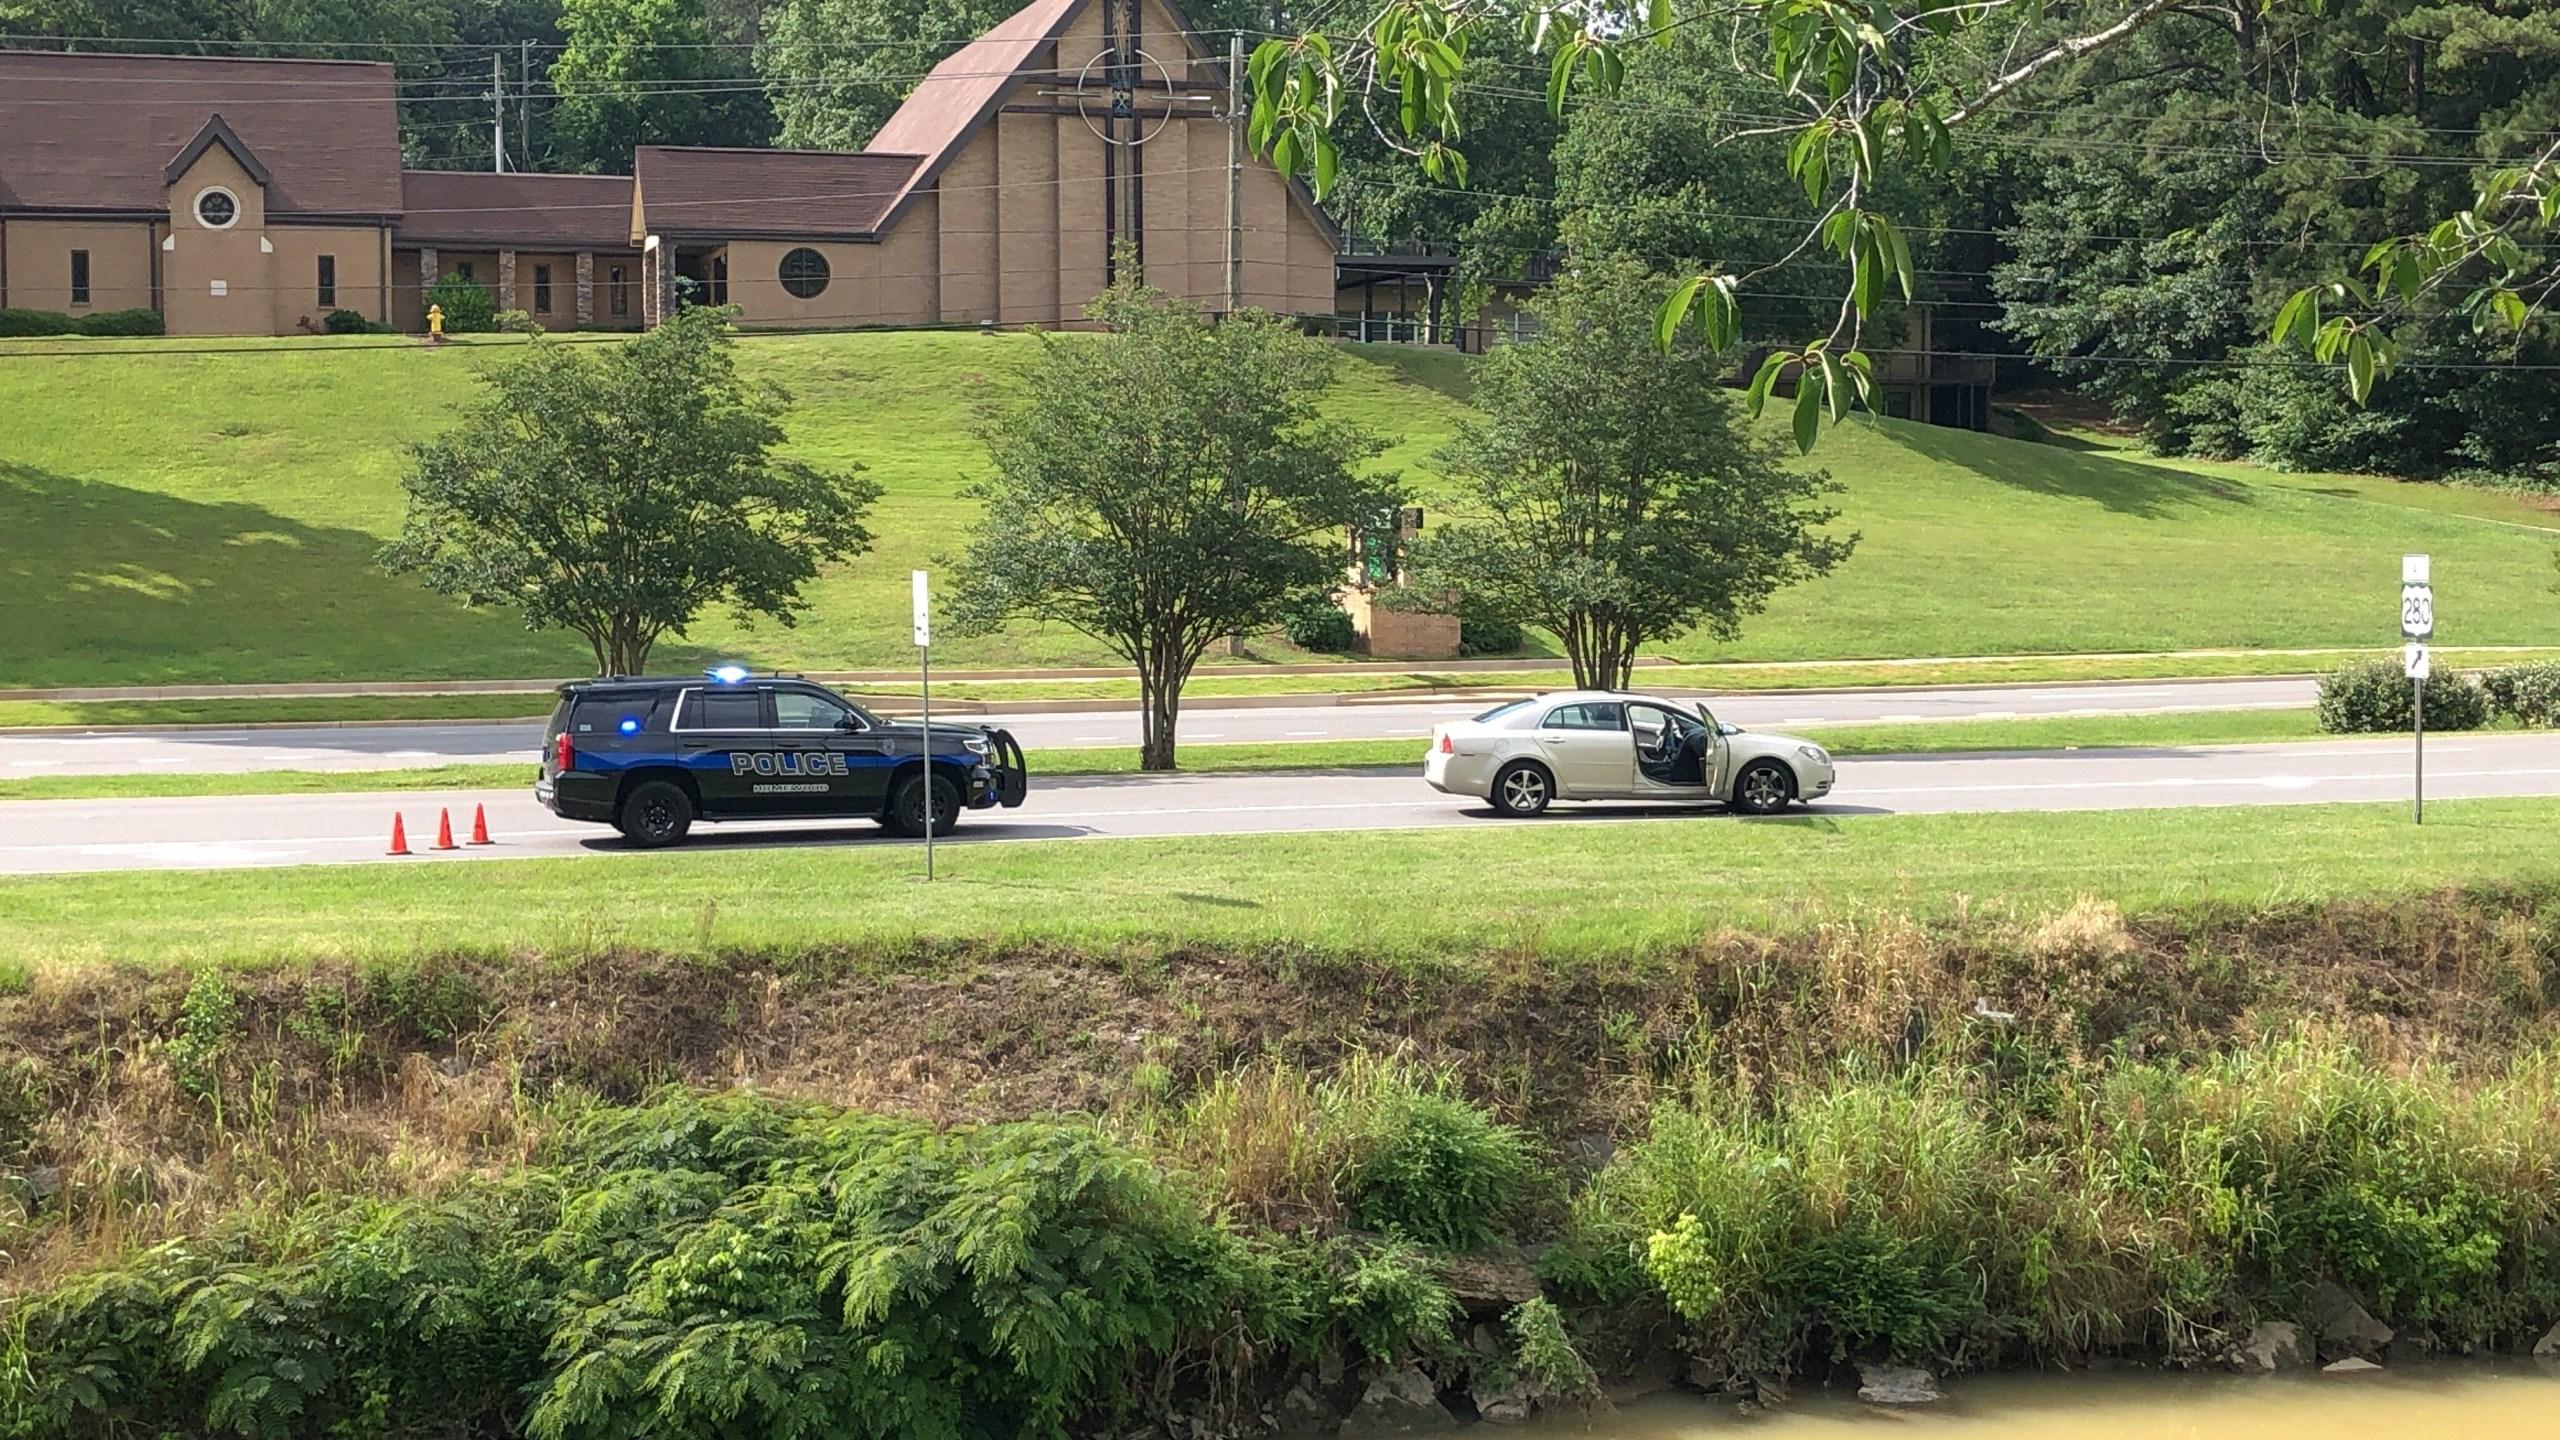 brookwood homewood area pedestrian struck_1560117660810.jpg.jpg